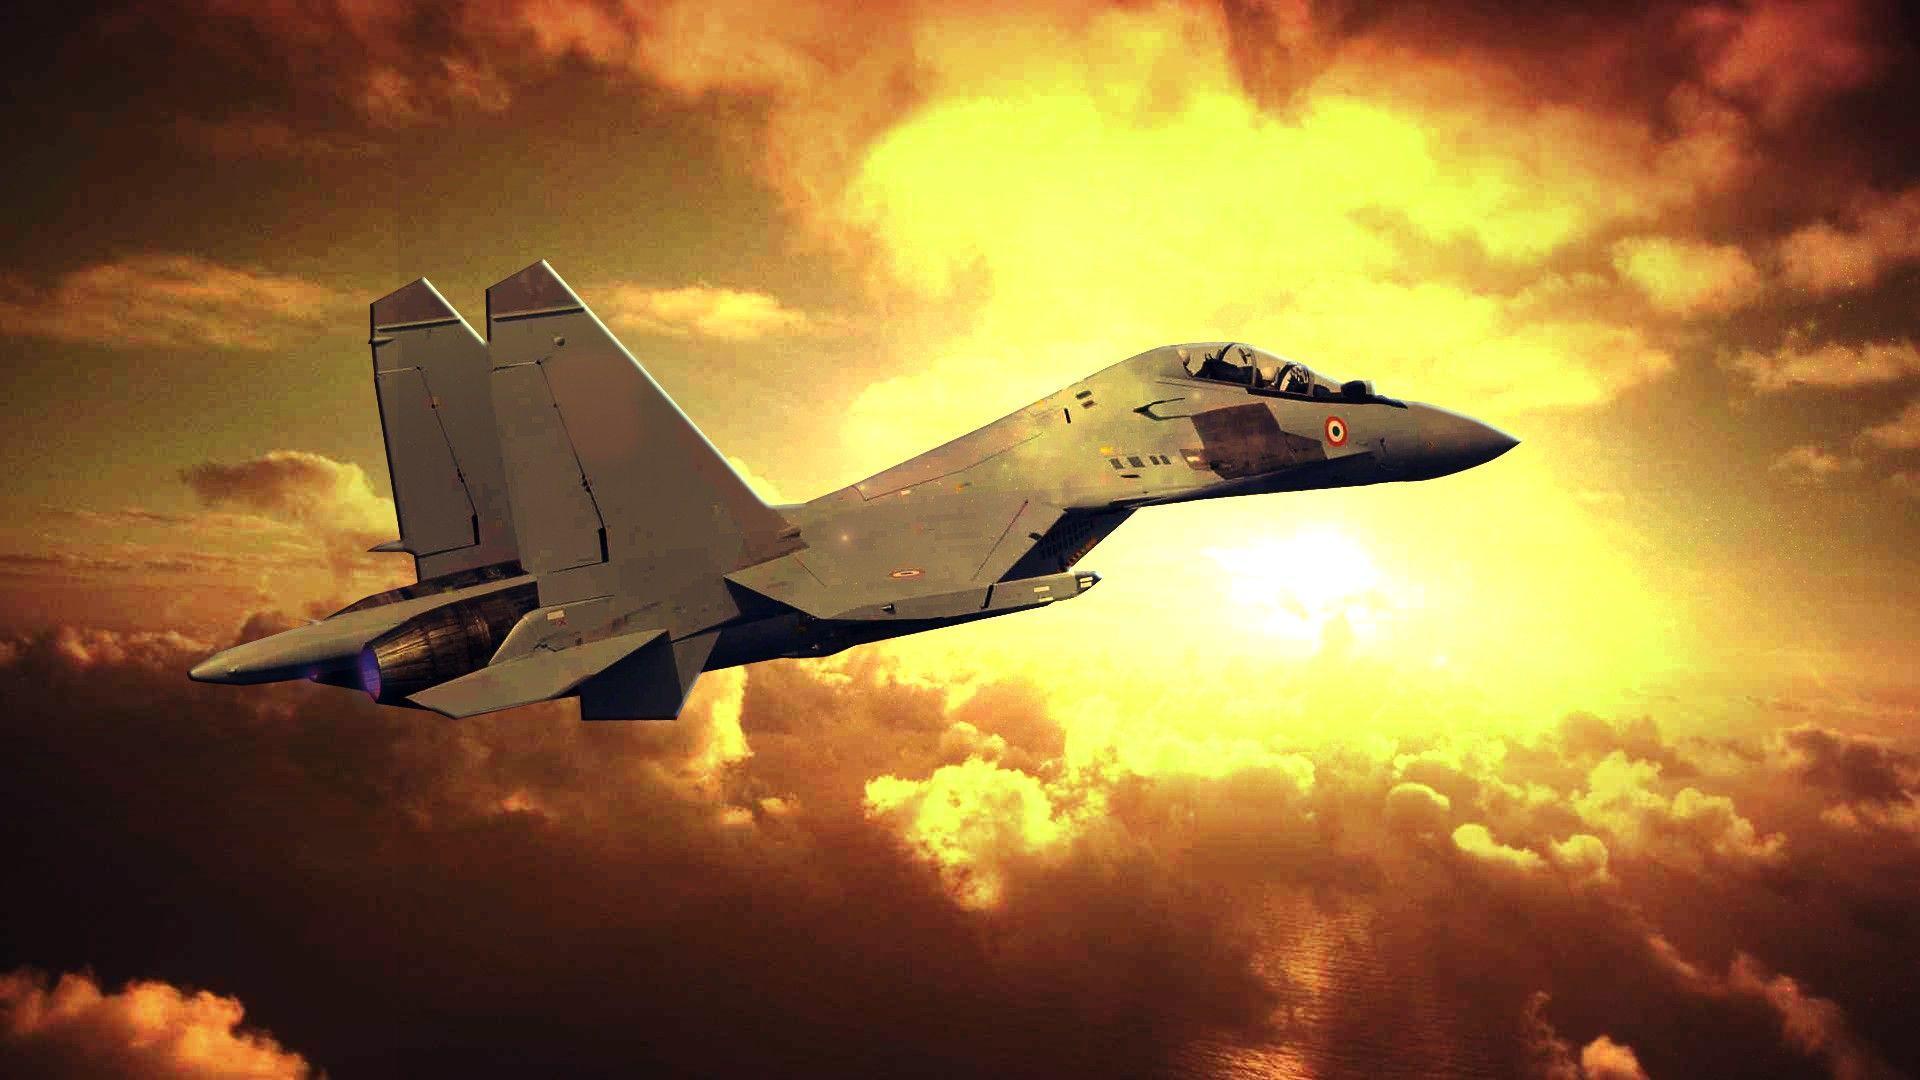 Fighter Jet Backgrounds - Wallpaper Cave